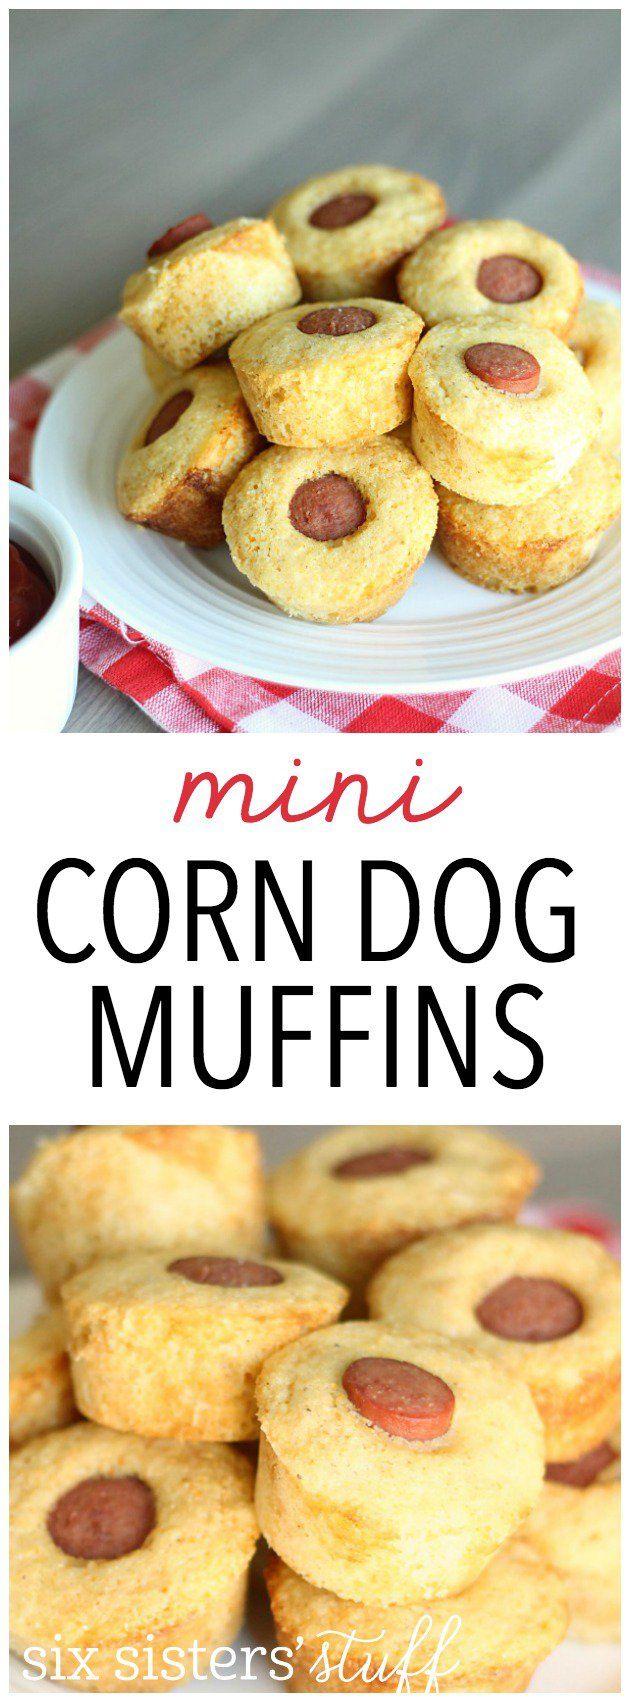 My kids LOVE these Mini Corn Dog Muffins from SixSistersStuff.com!